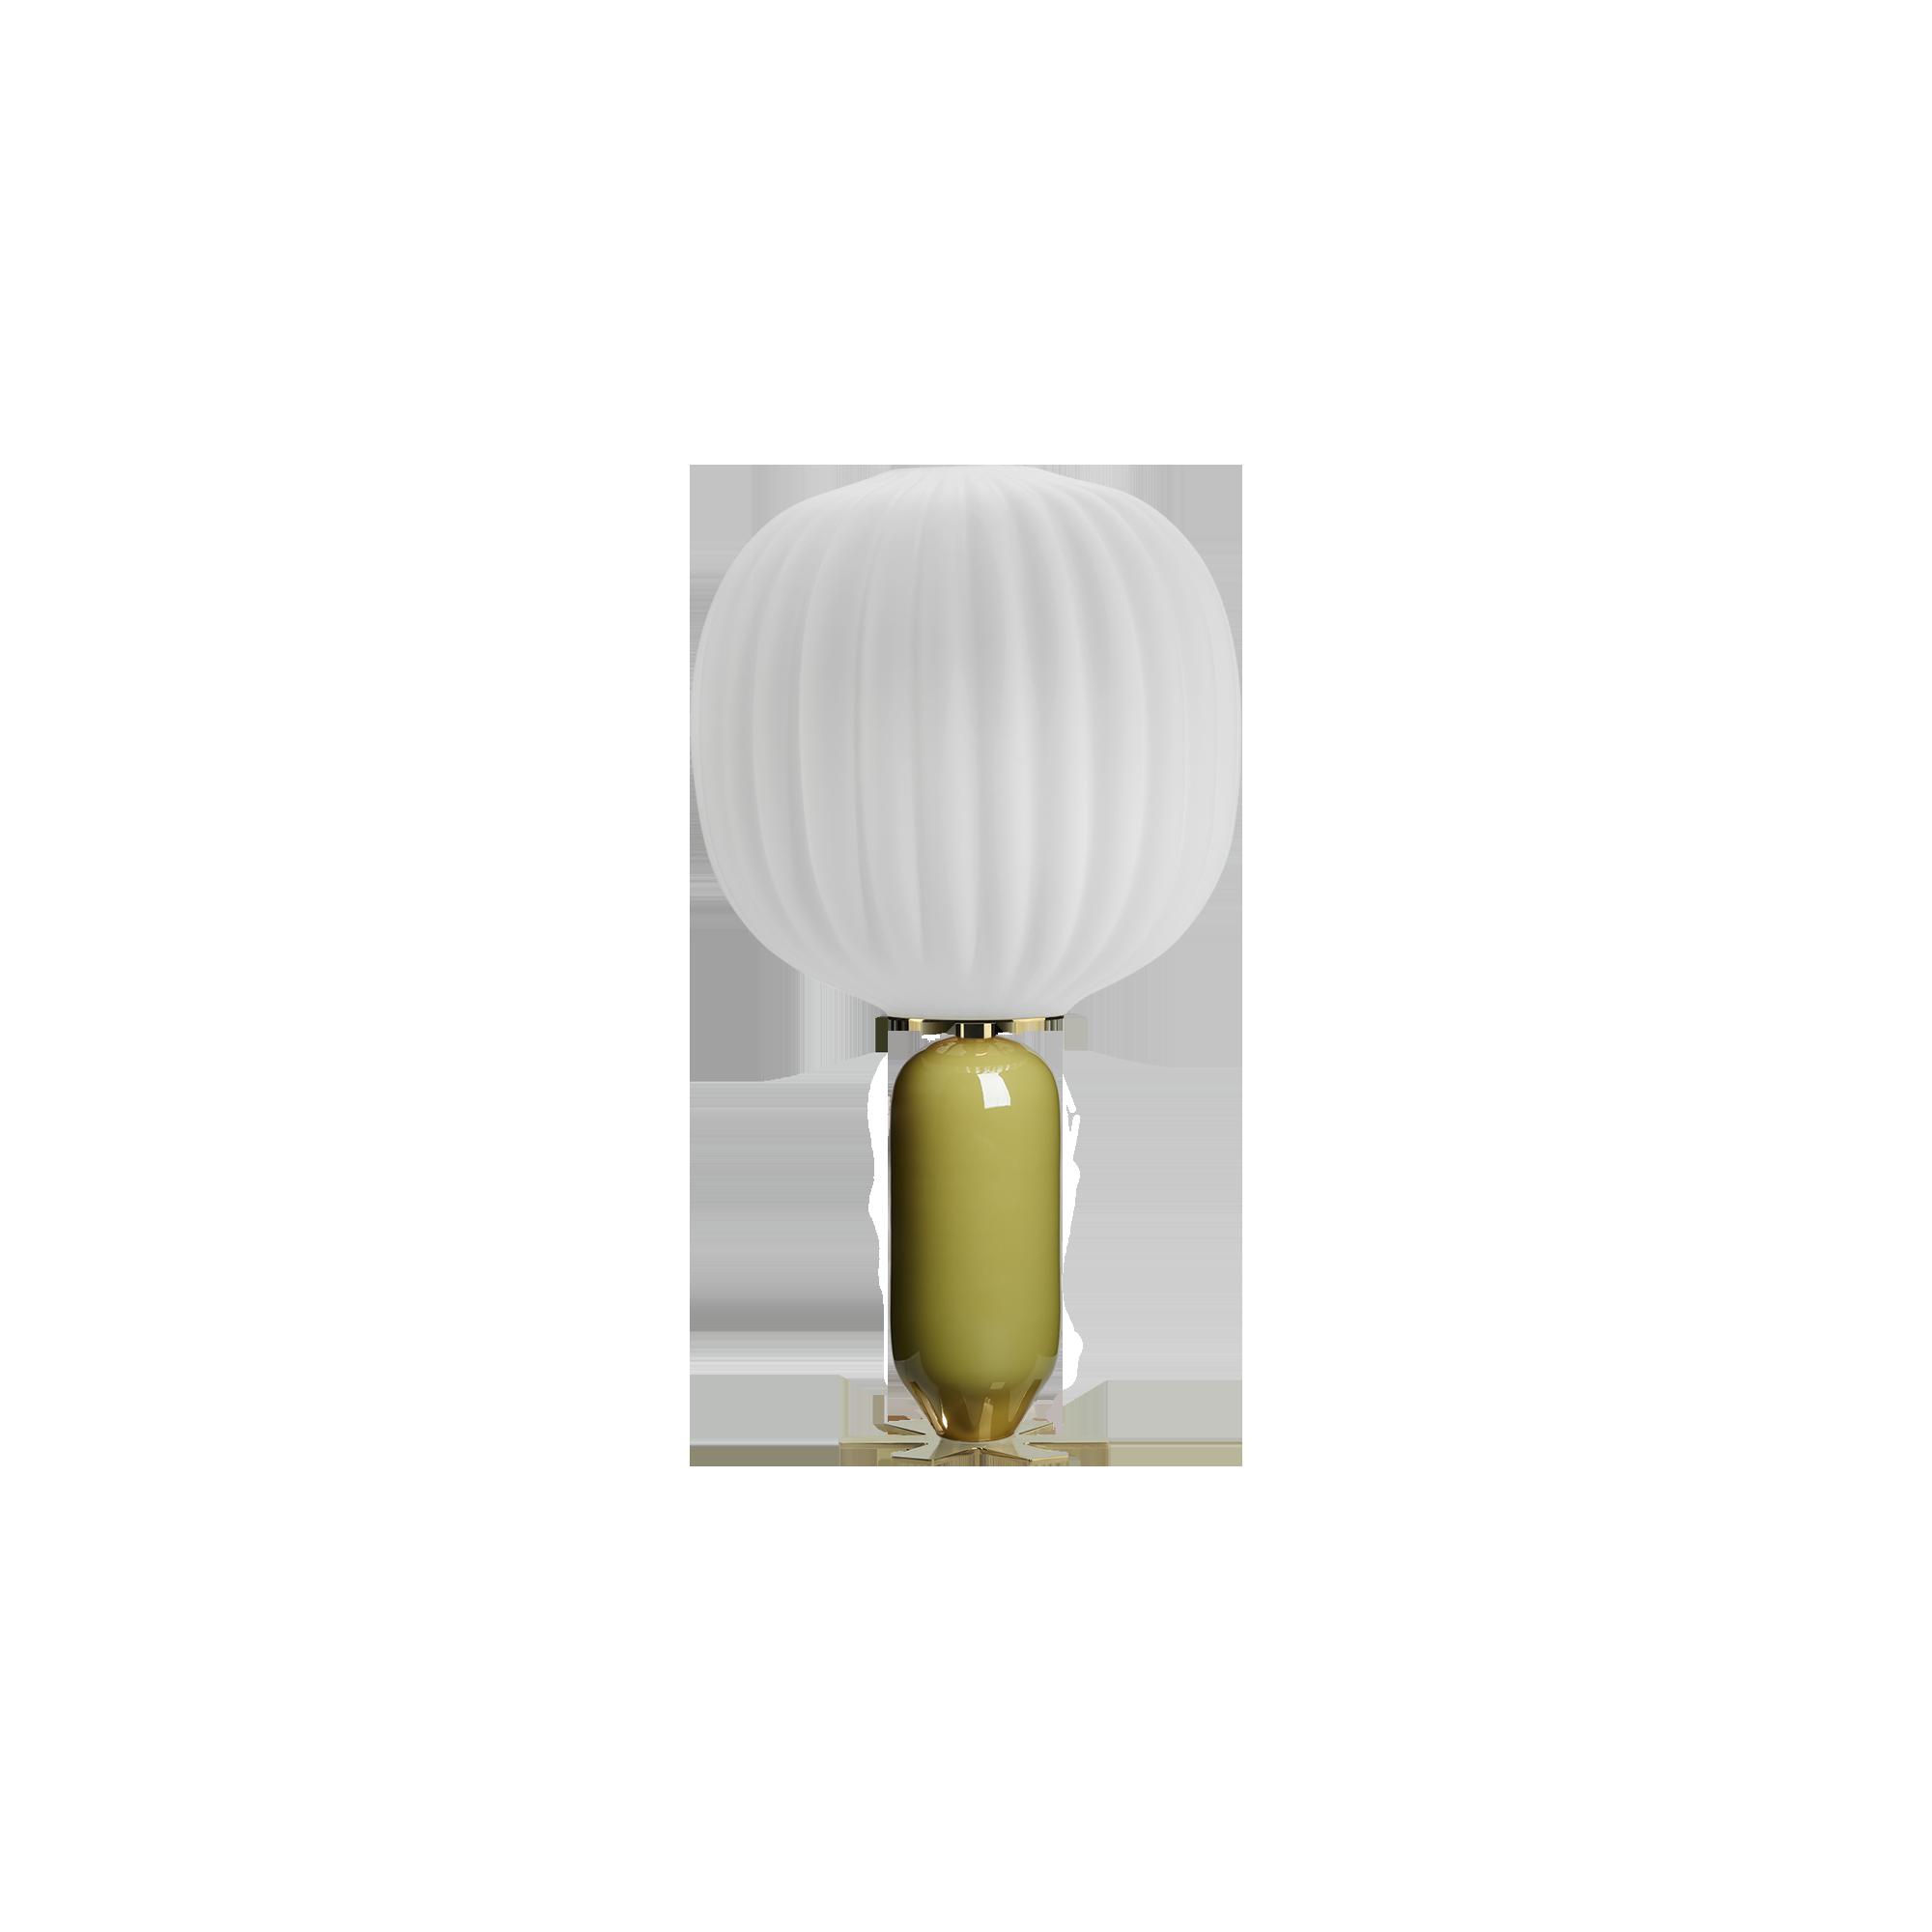 Casanova lamp - India Mahdavi